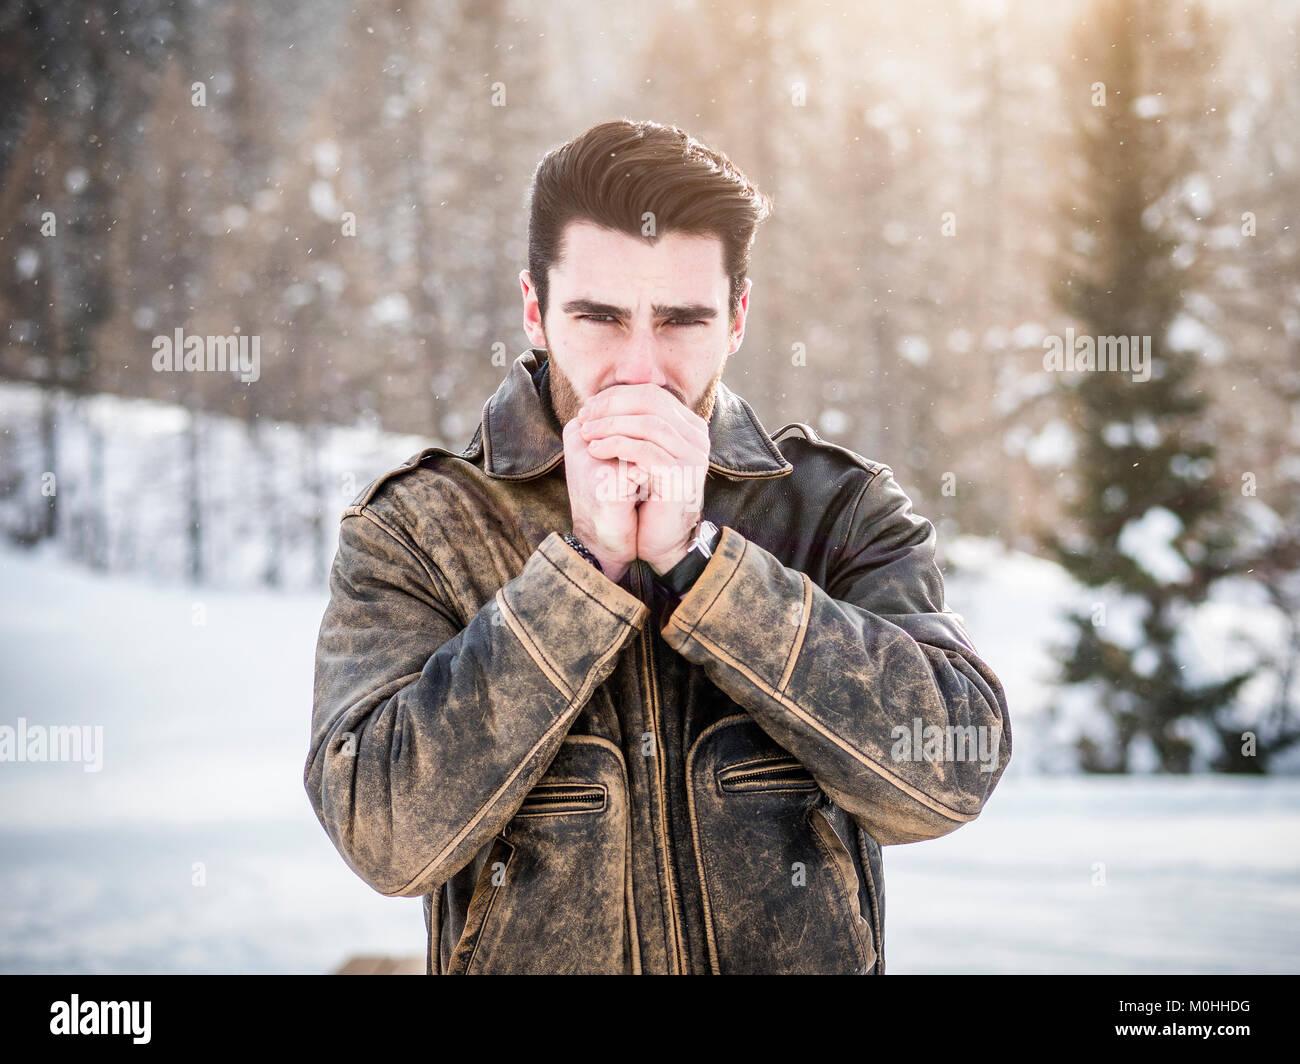 Male Model Posing In Snow Stock Photos & Male Model Posing